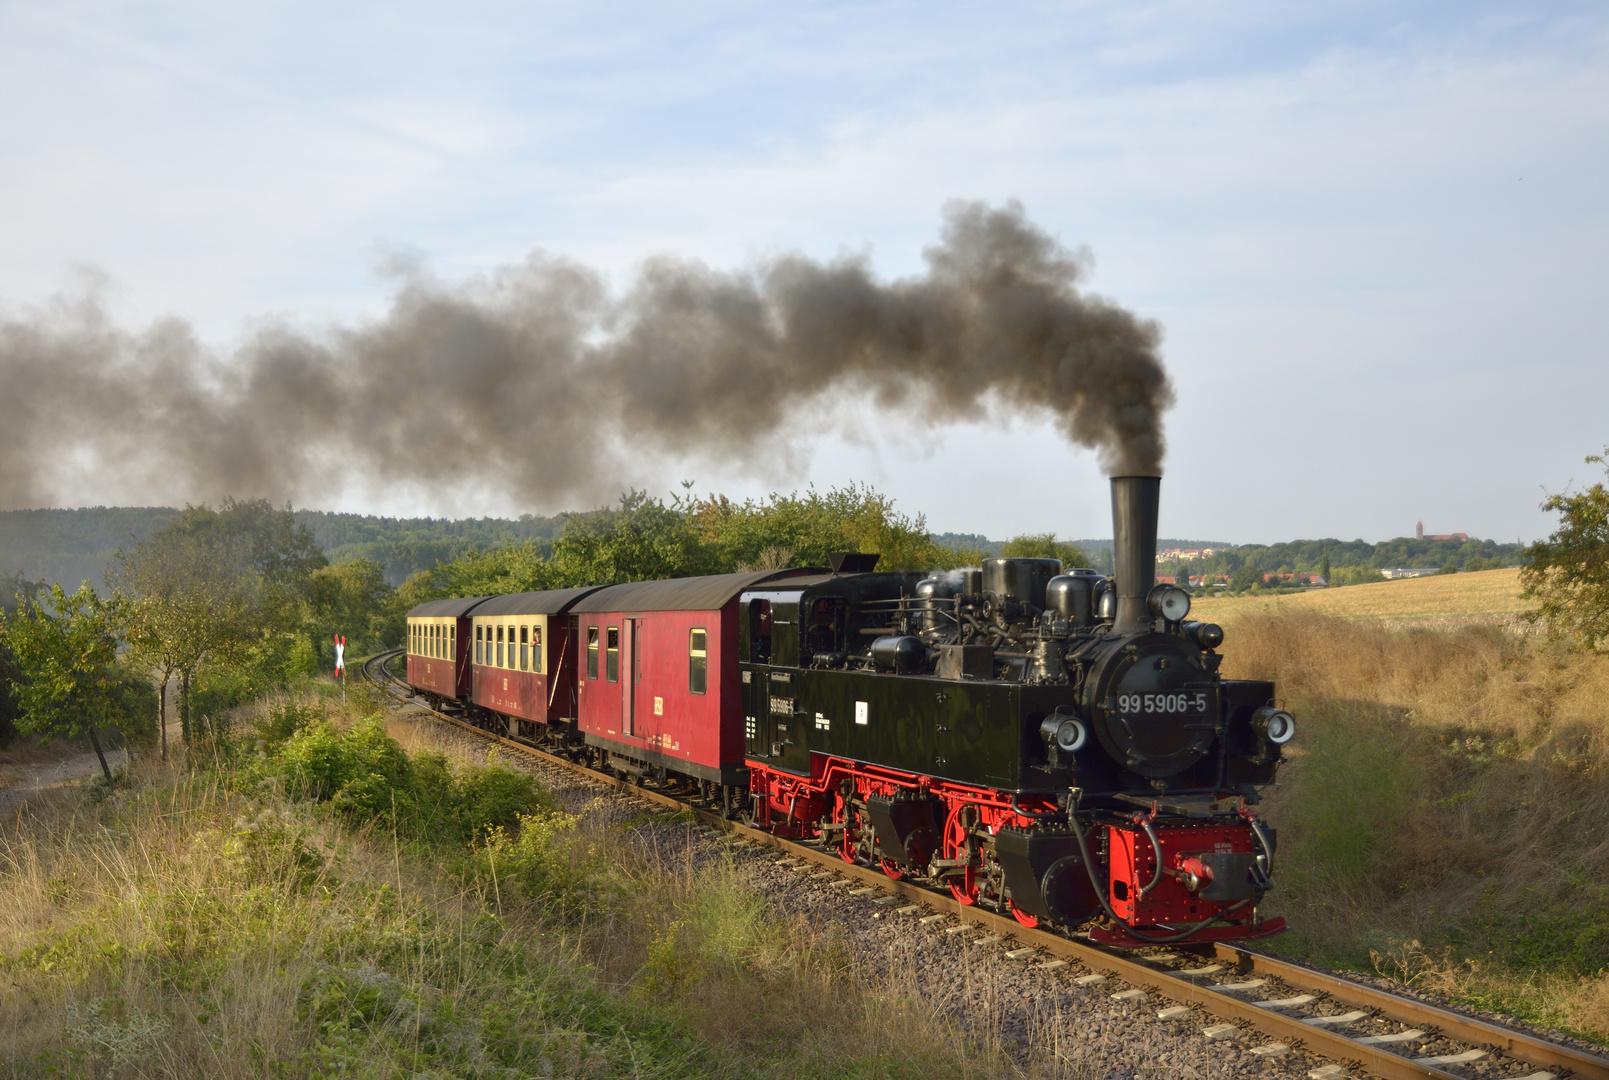 Spätsommergruß aus Quarmbeck (Selketalbahn)